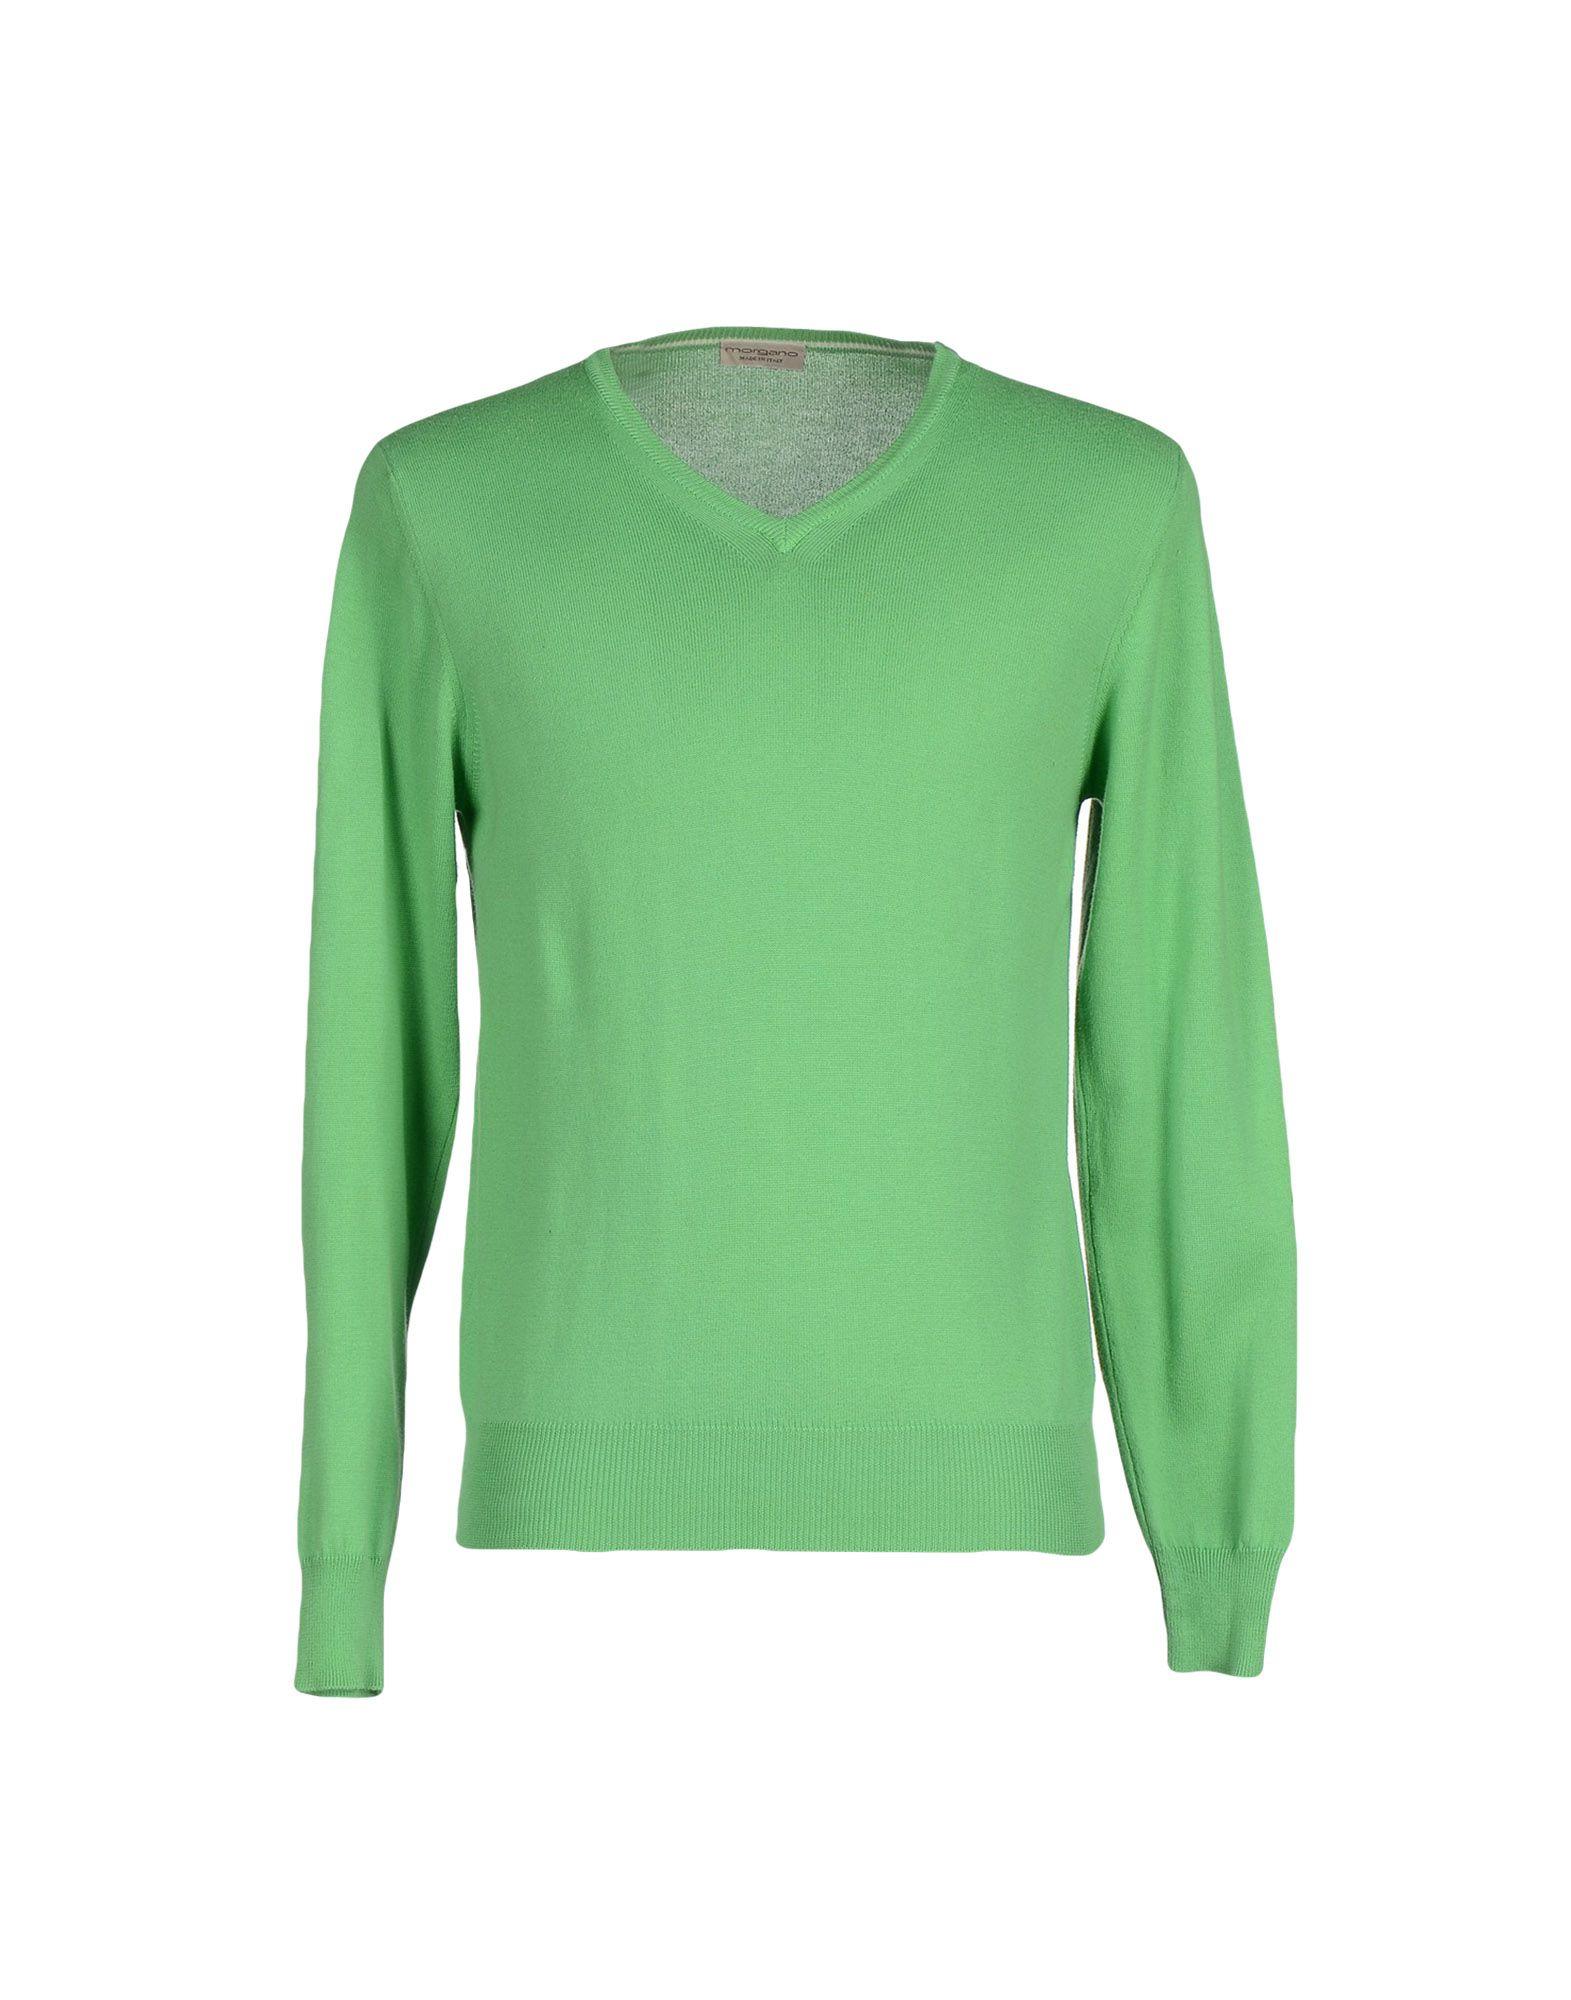 MORGANO Sweater in Light Green